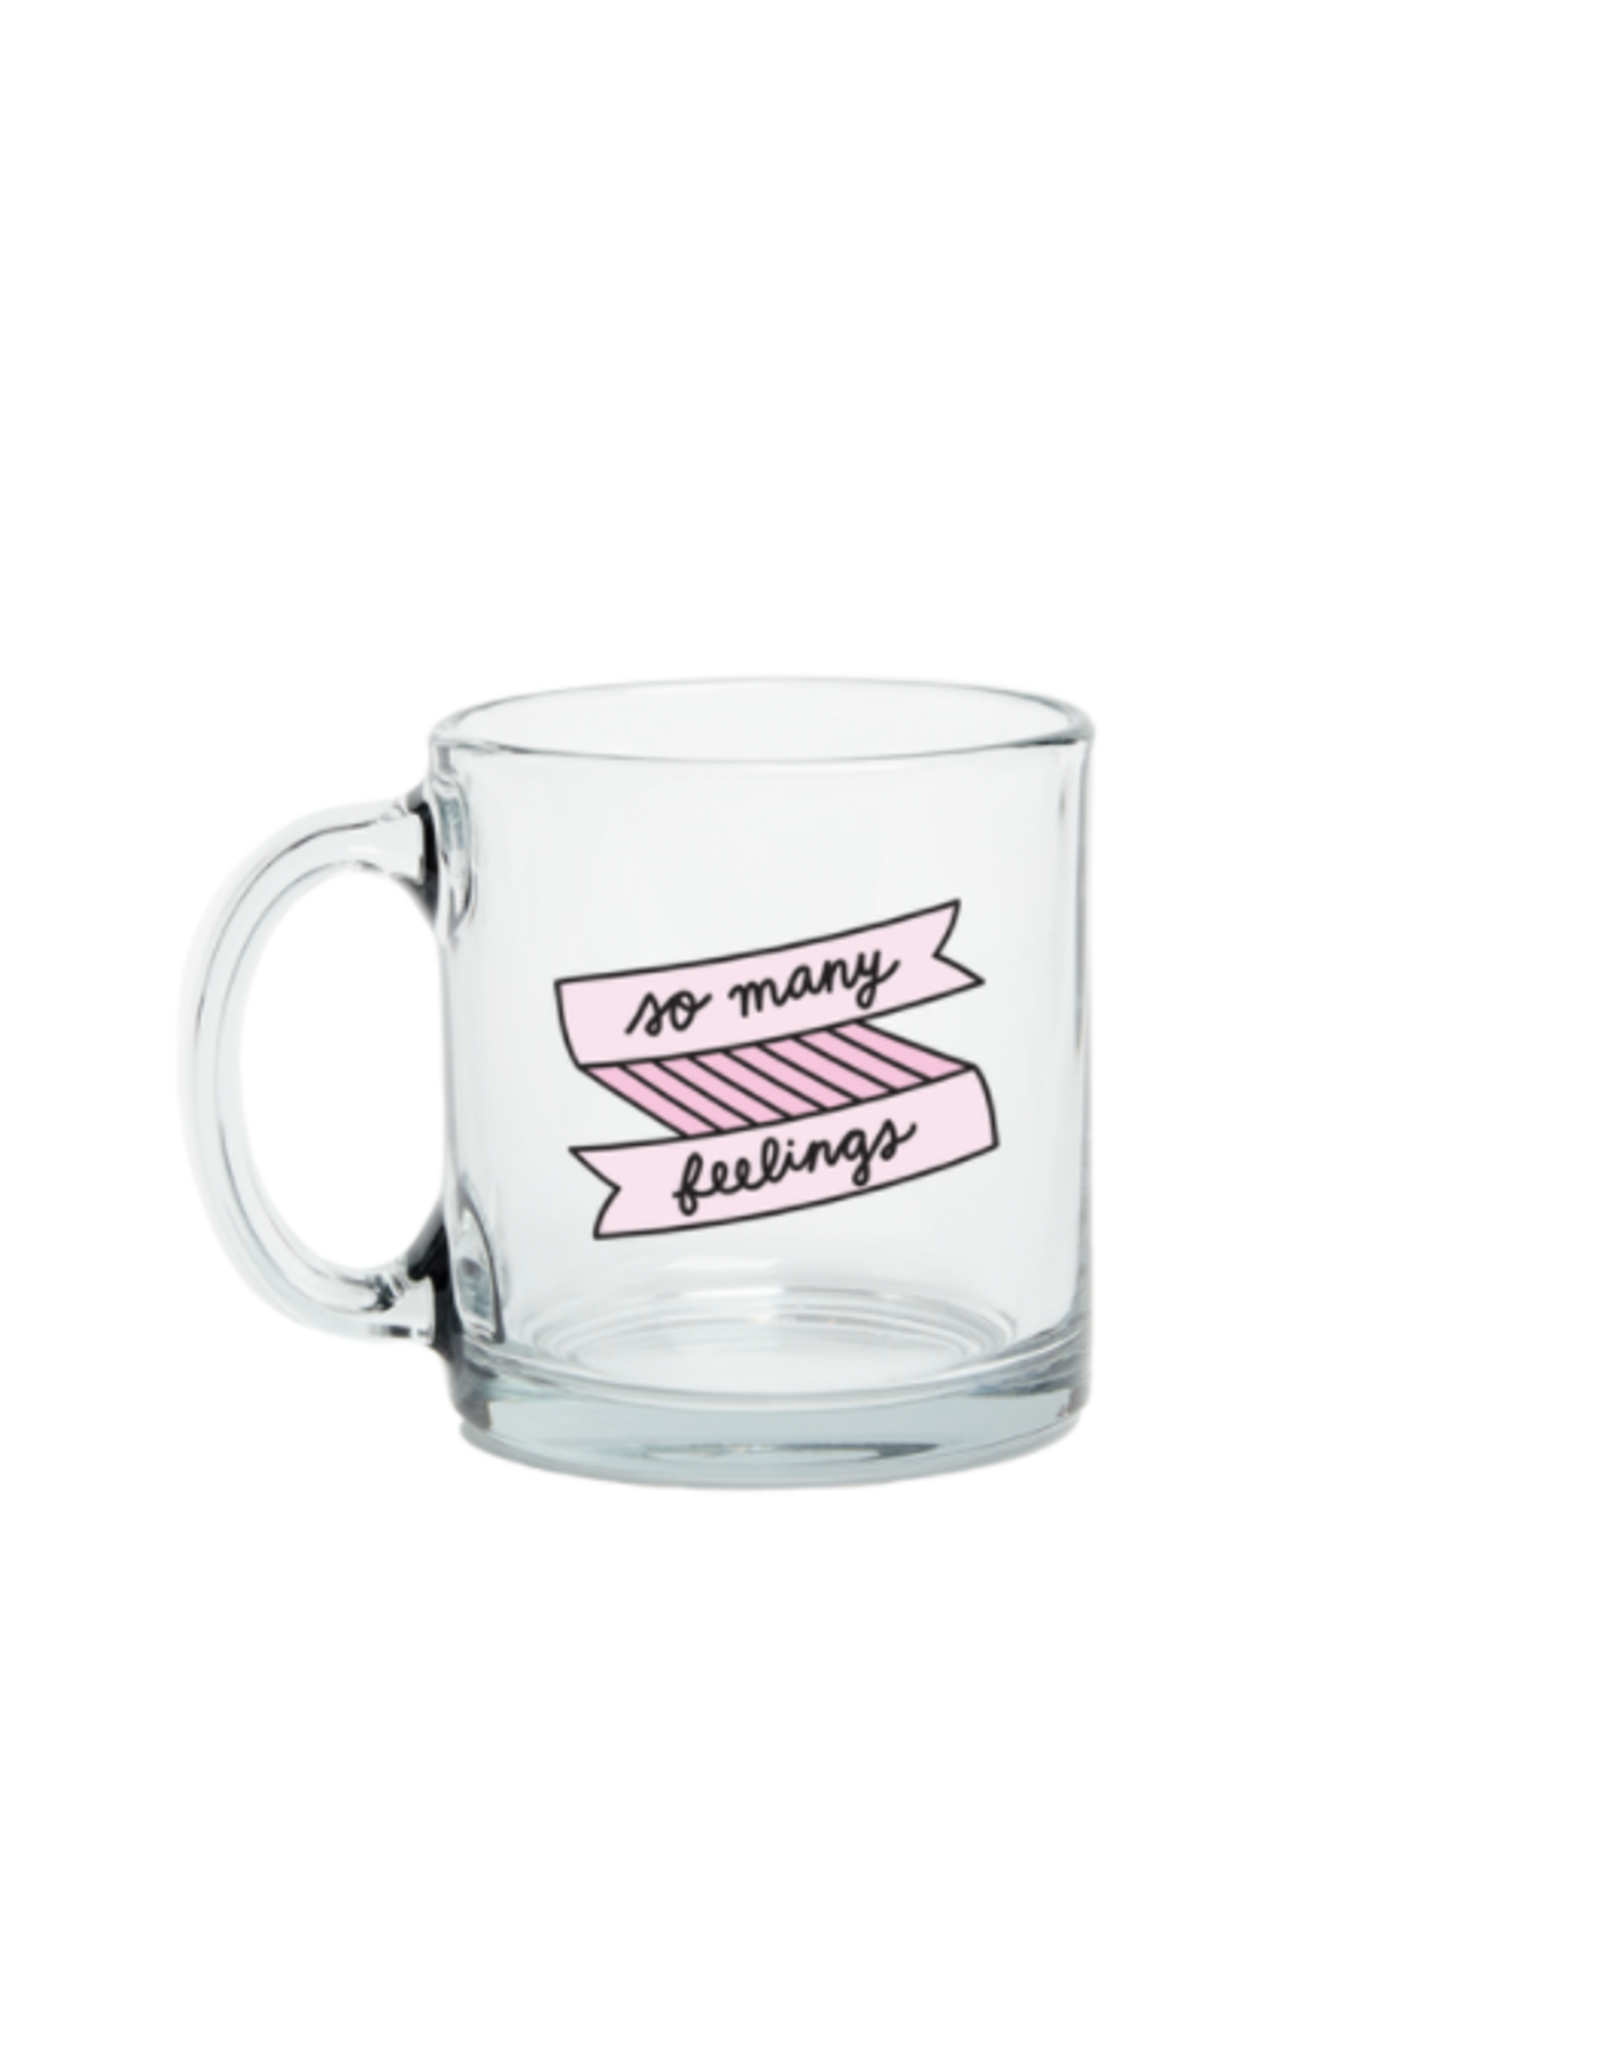 Talking Out of Turn So Many Feelings - Glass Mug